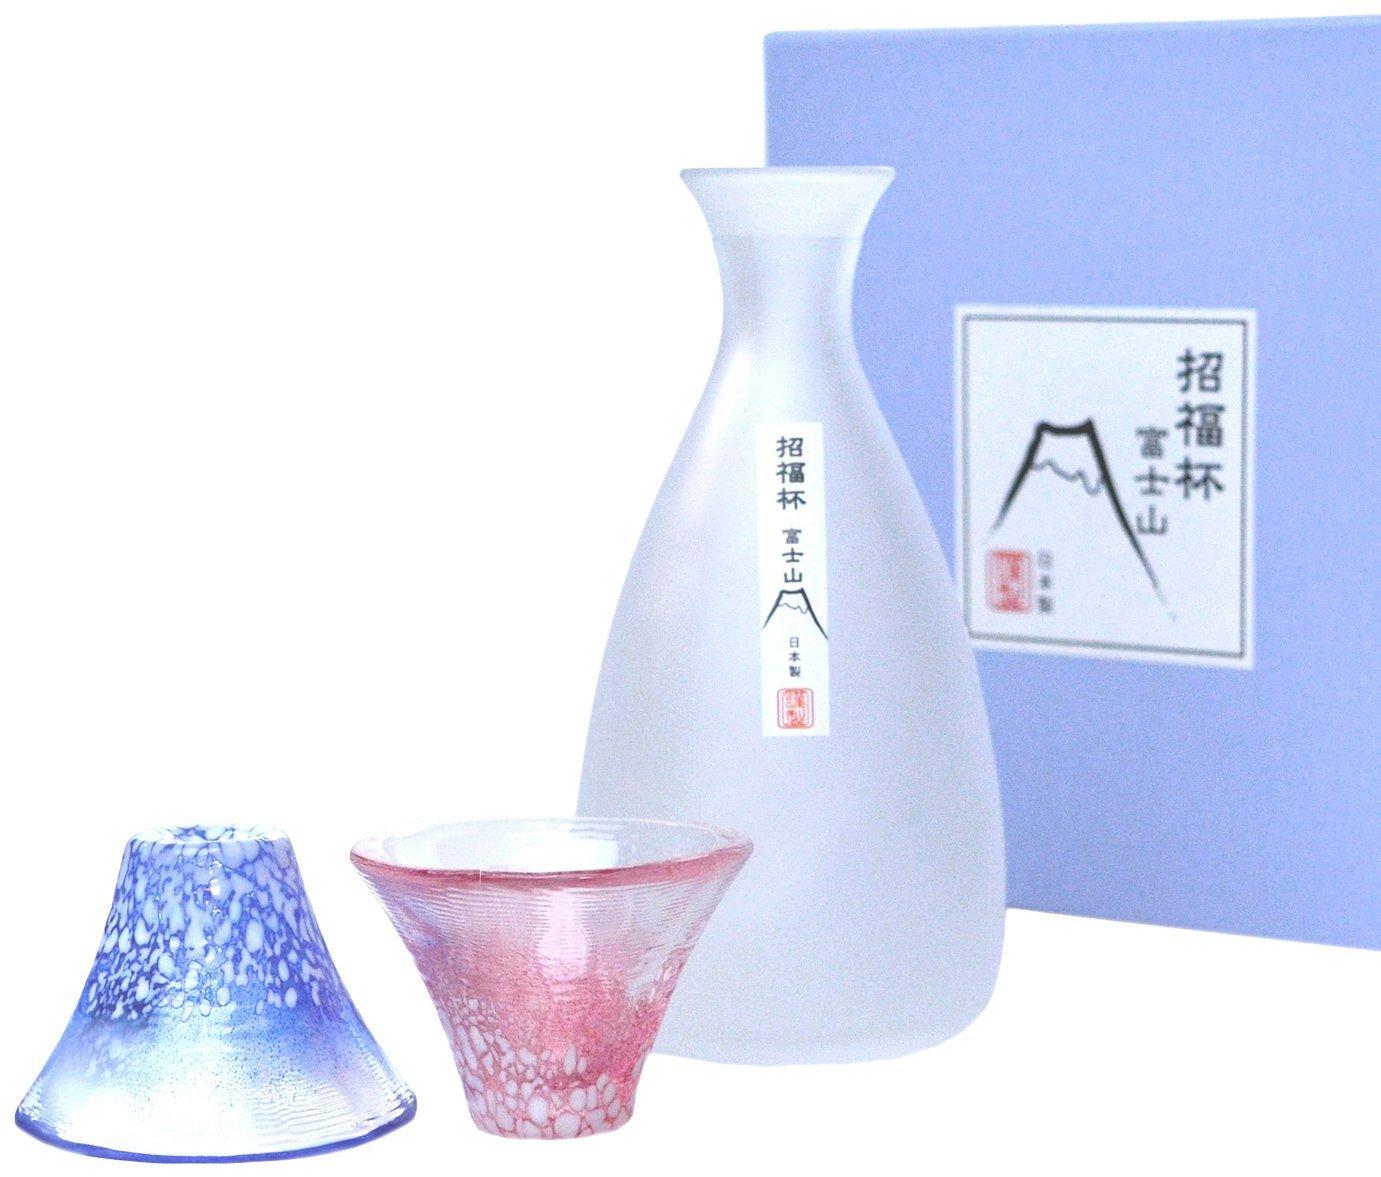 Made in Japan ]µ•ŸCup Mount Fuji cup sake bottle set Gift BOX containing ( capacity Cup 35ml ~ 2 pieces , sake bottle 270ml) G639-M76